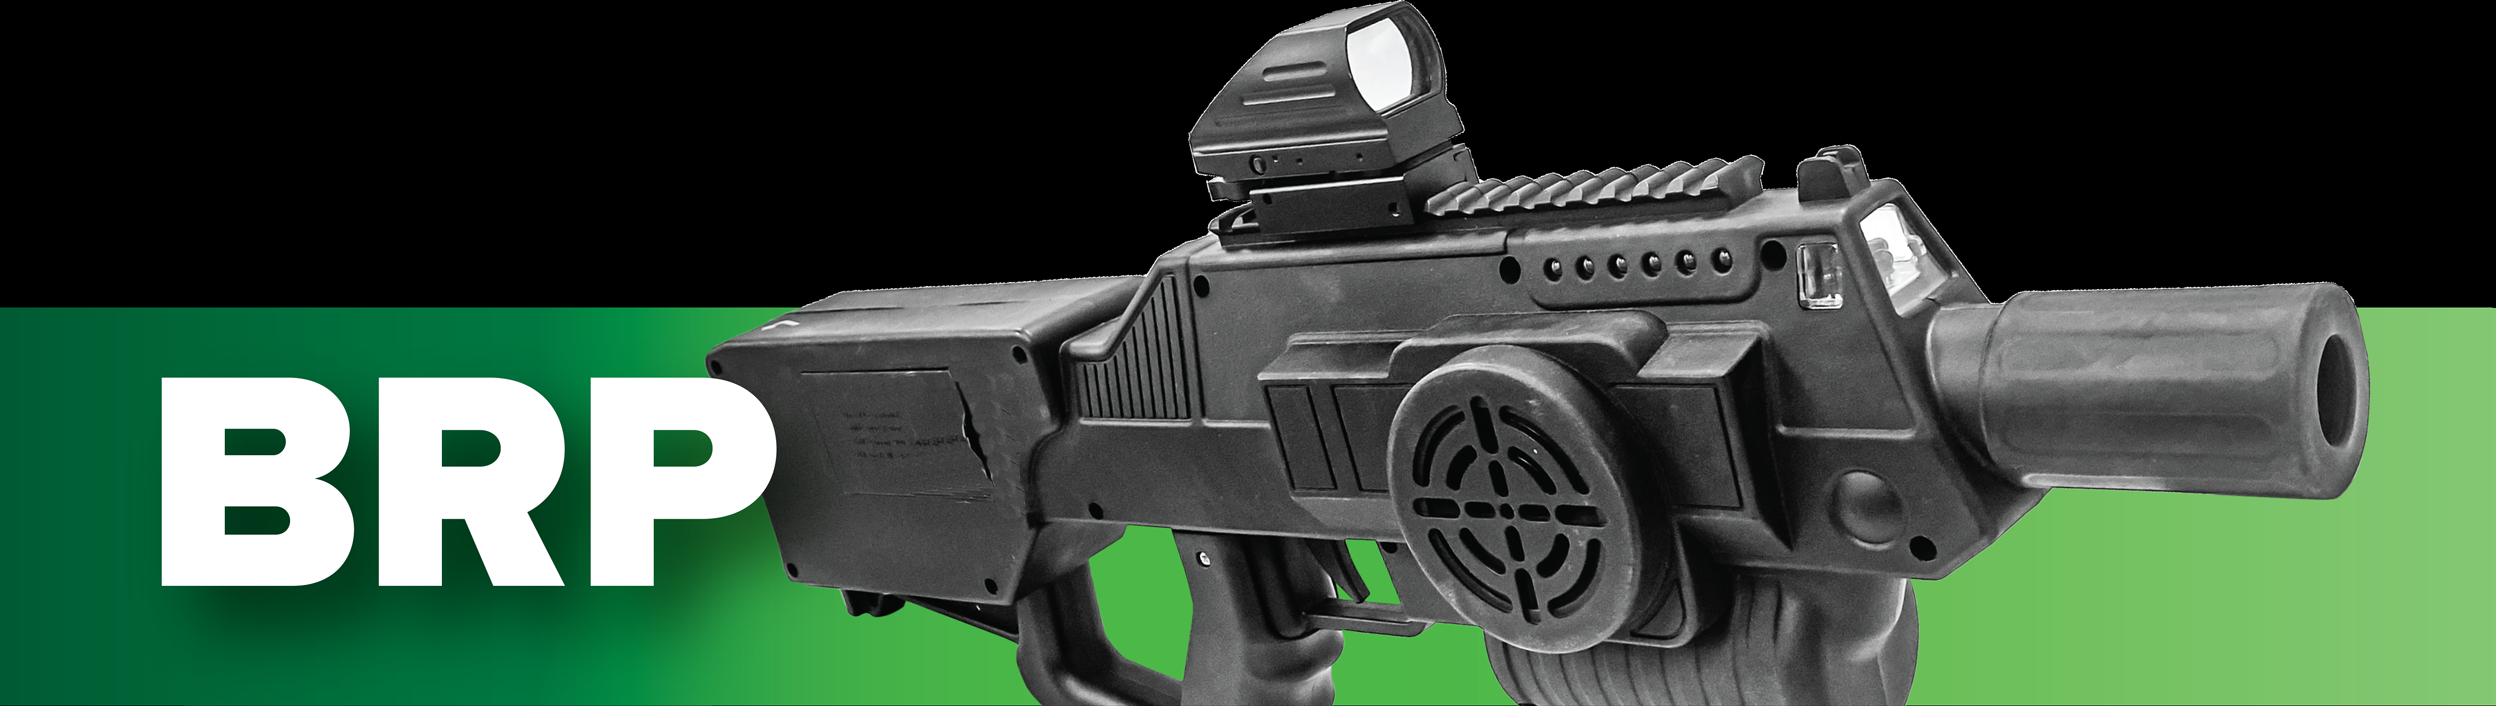 battle rifle laser tag